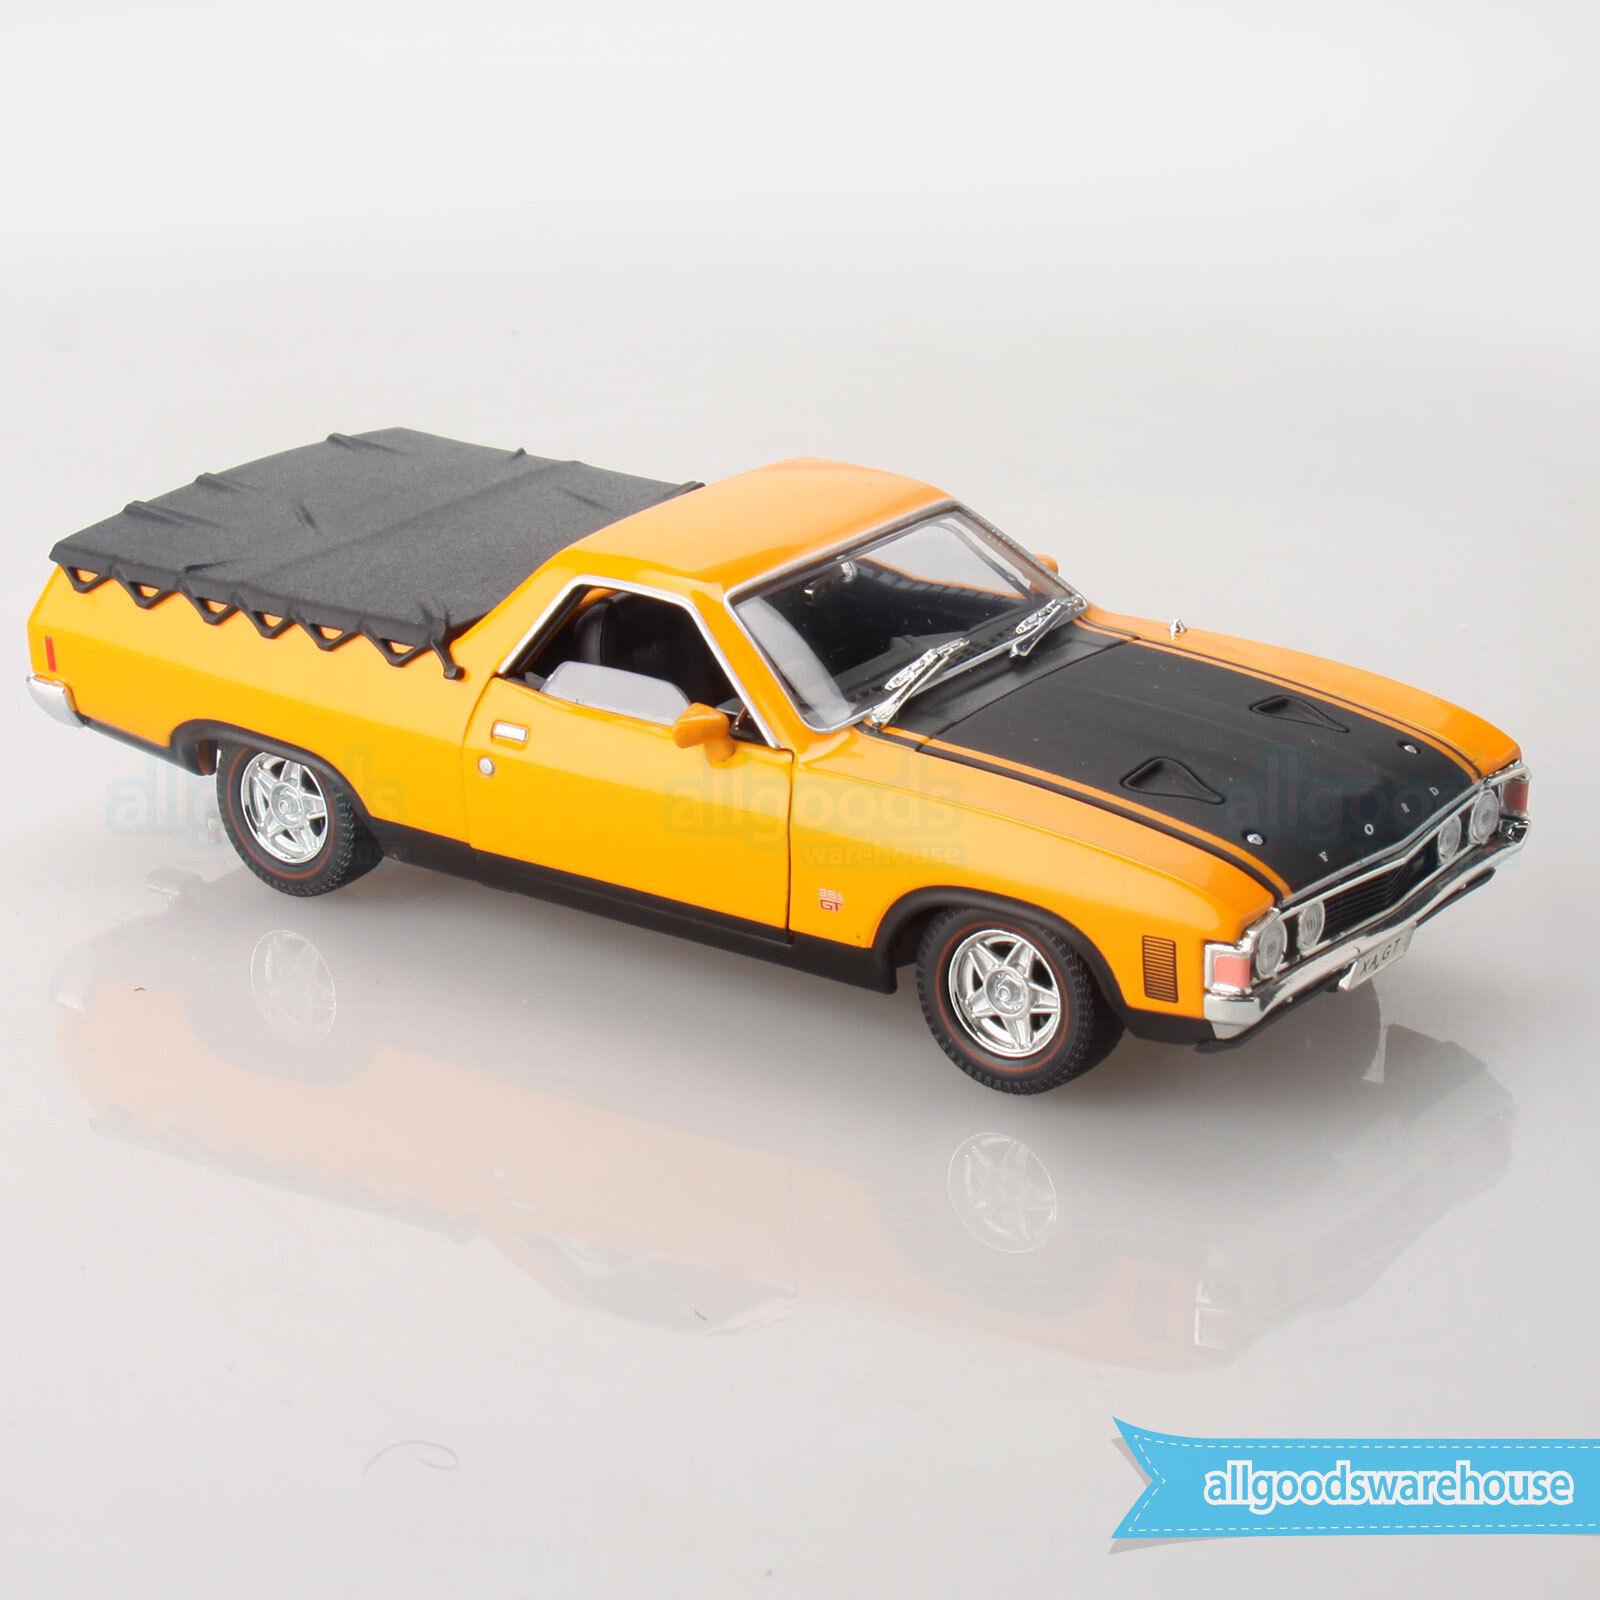 Ford Falcon XA 351 GT Ute 1 32 Scale Aussie Classic Diecast Car Yellow Fire